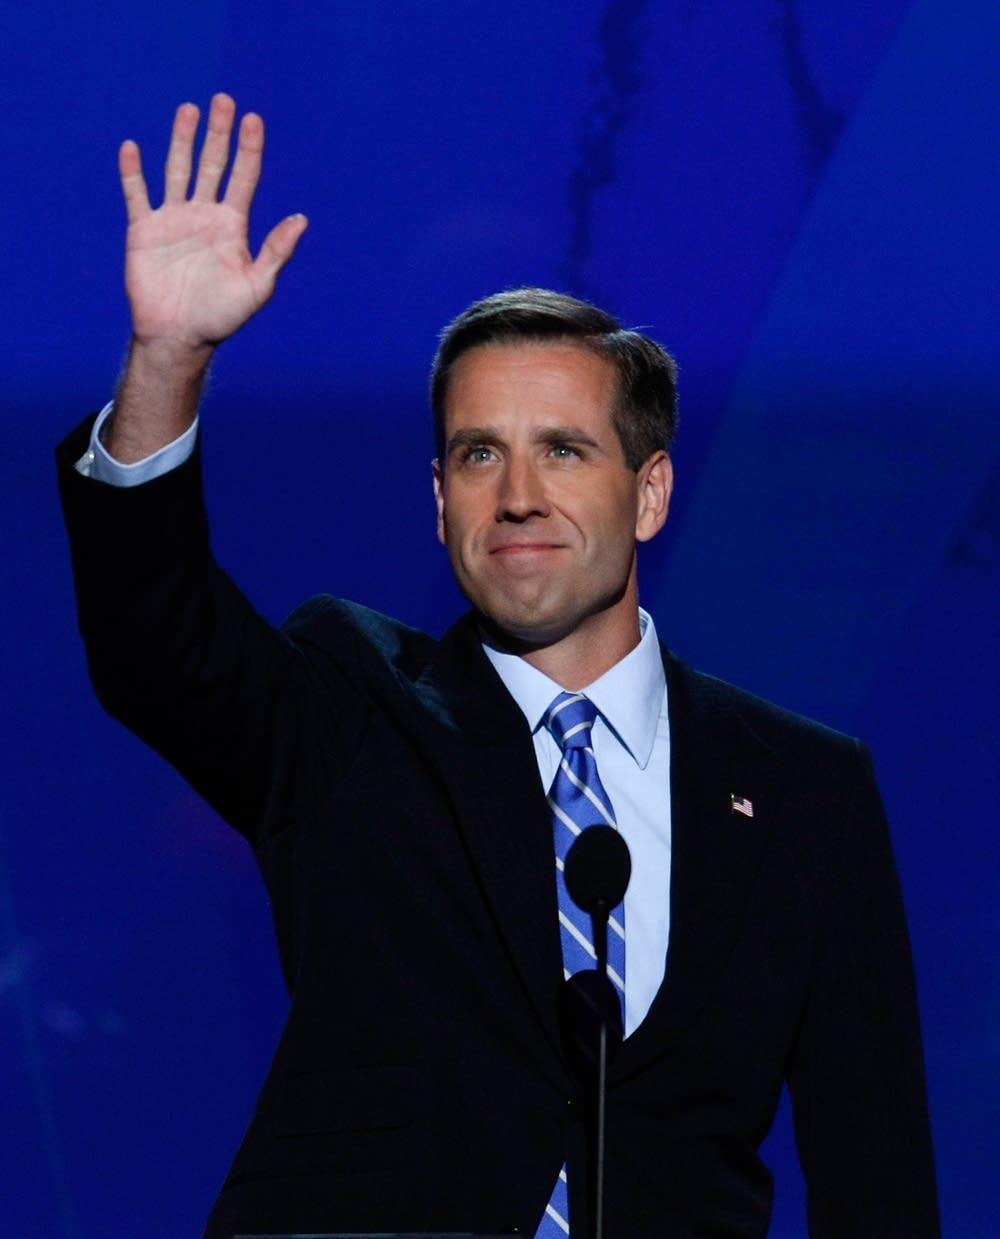 Bo Biden waves to the crowd of delegates